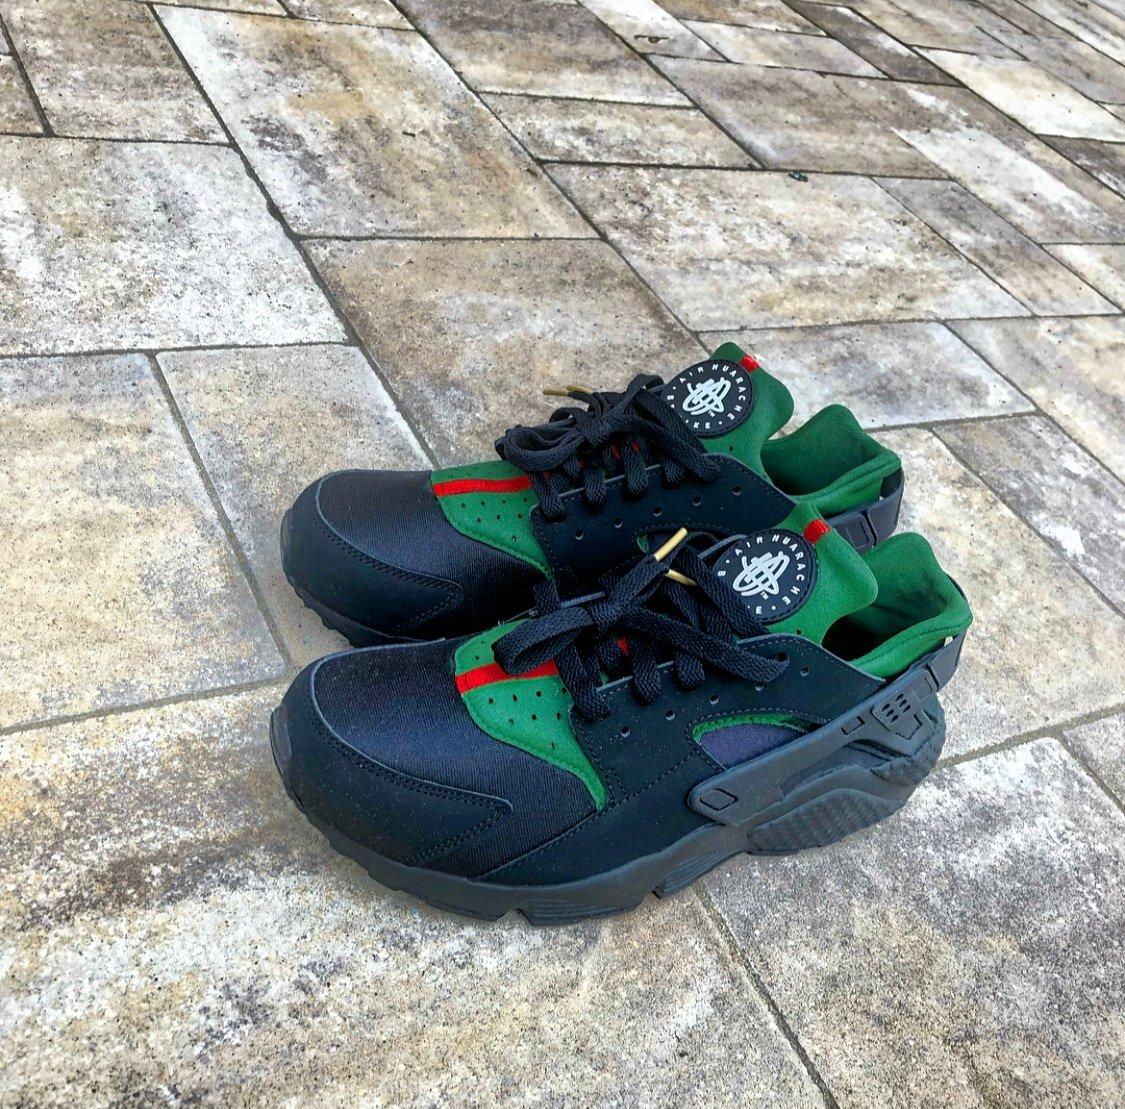 Image of Men's Nike Huarache Black 'Gucci' Custom